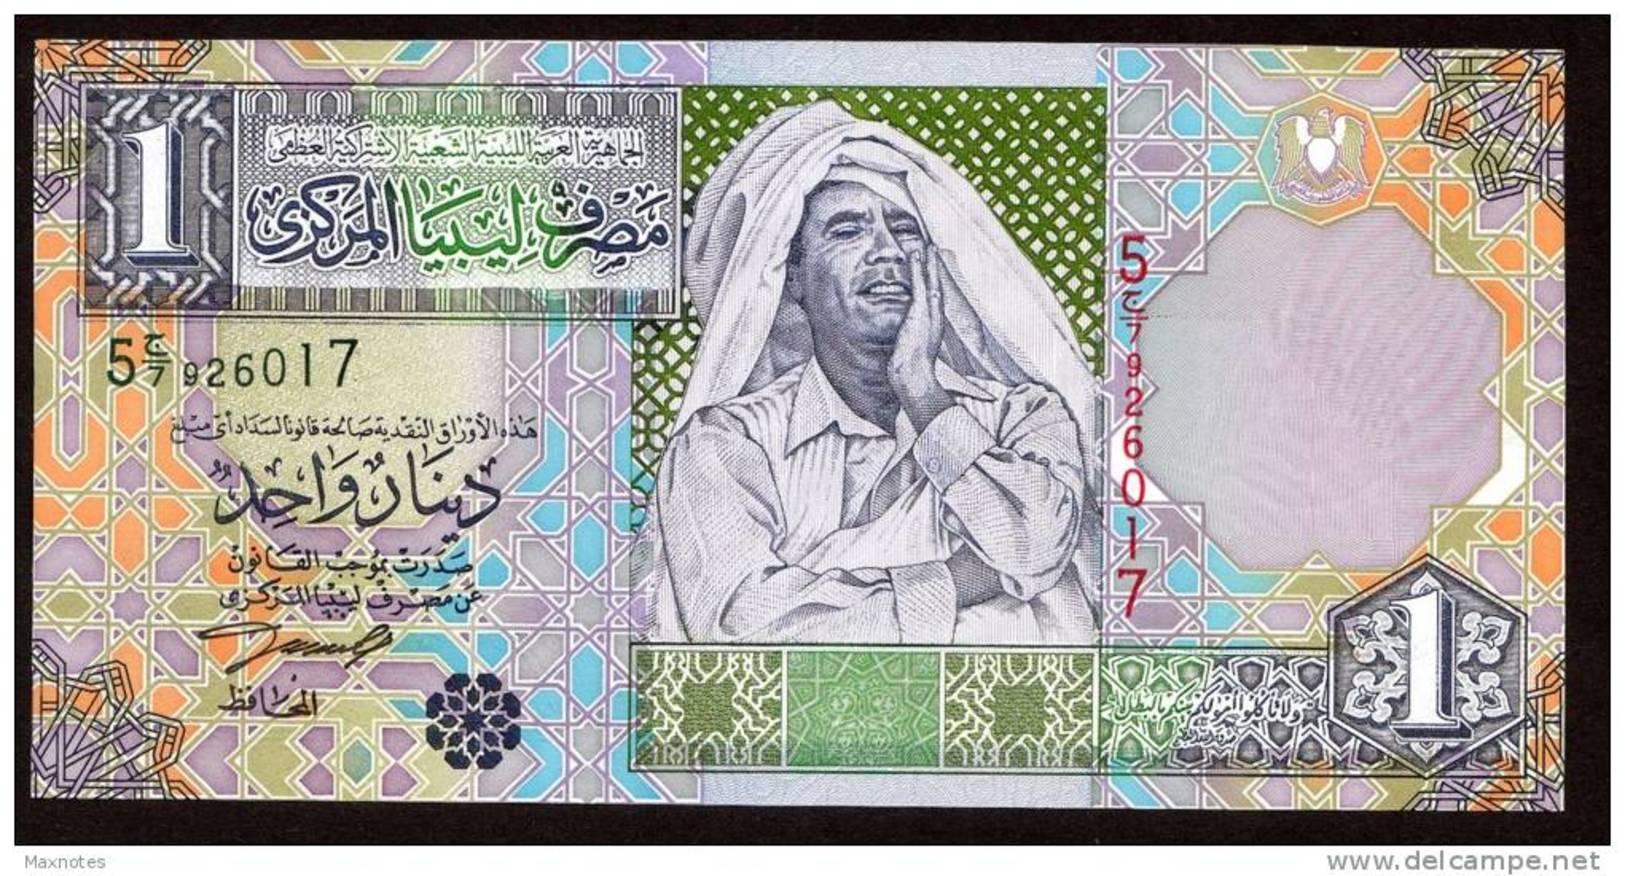 LIBIA (LIBYA) : Banconota 1 Dinaro - 2002 - P64a – UNC - Libye